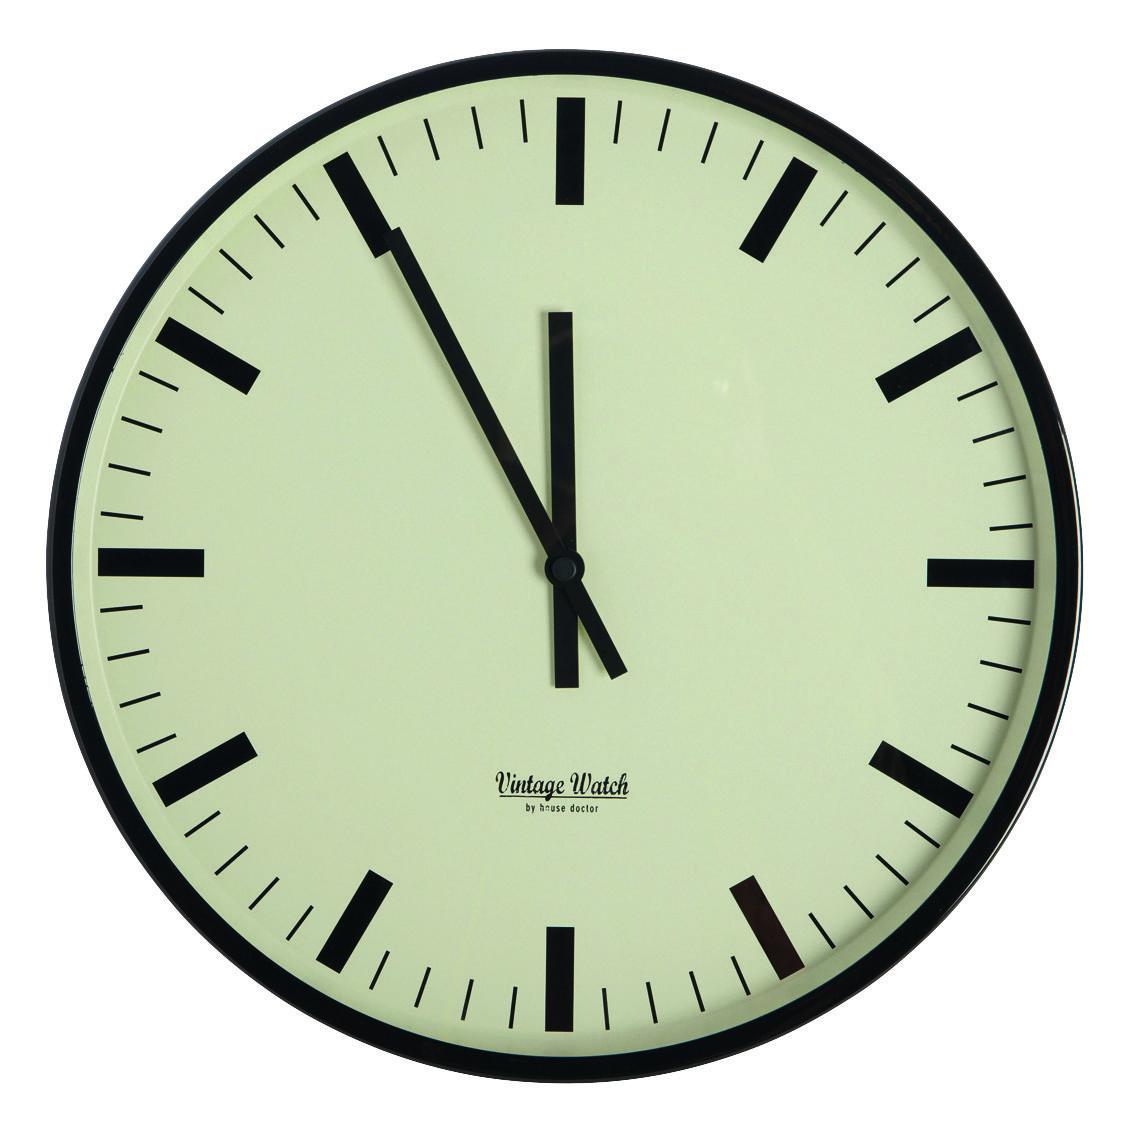 Déco - Horloges  - Horloge murale Station / Ø 38 cm - House Doctor - Olive / Noir - Métal